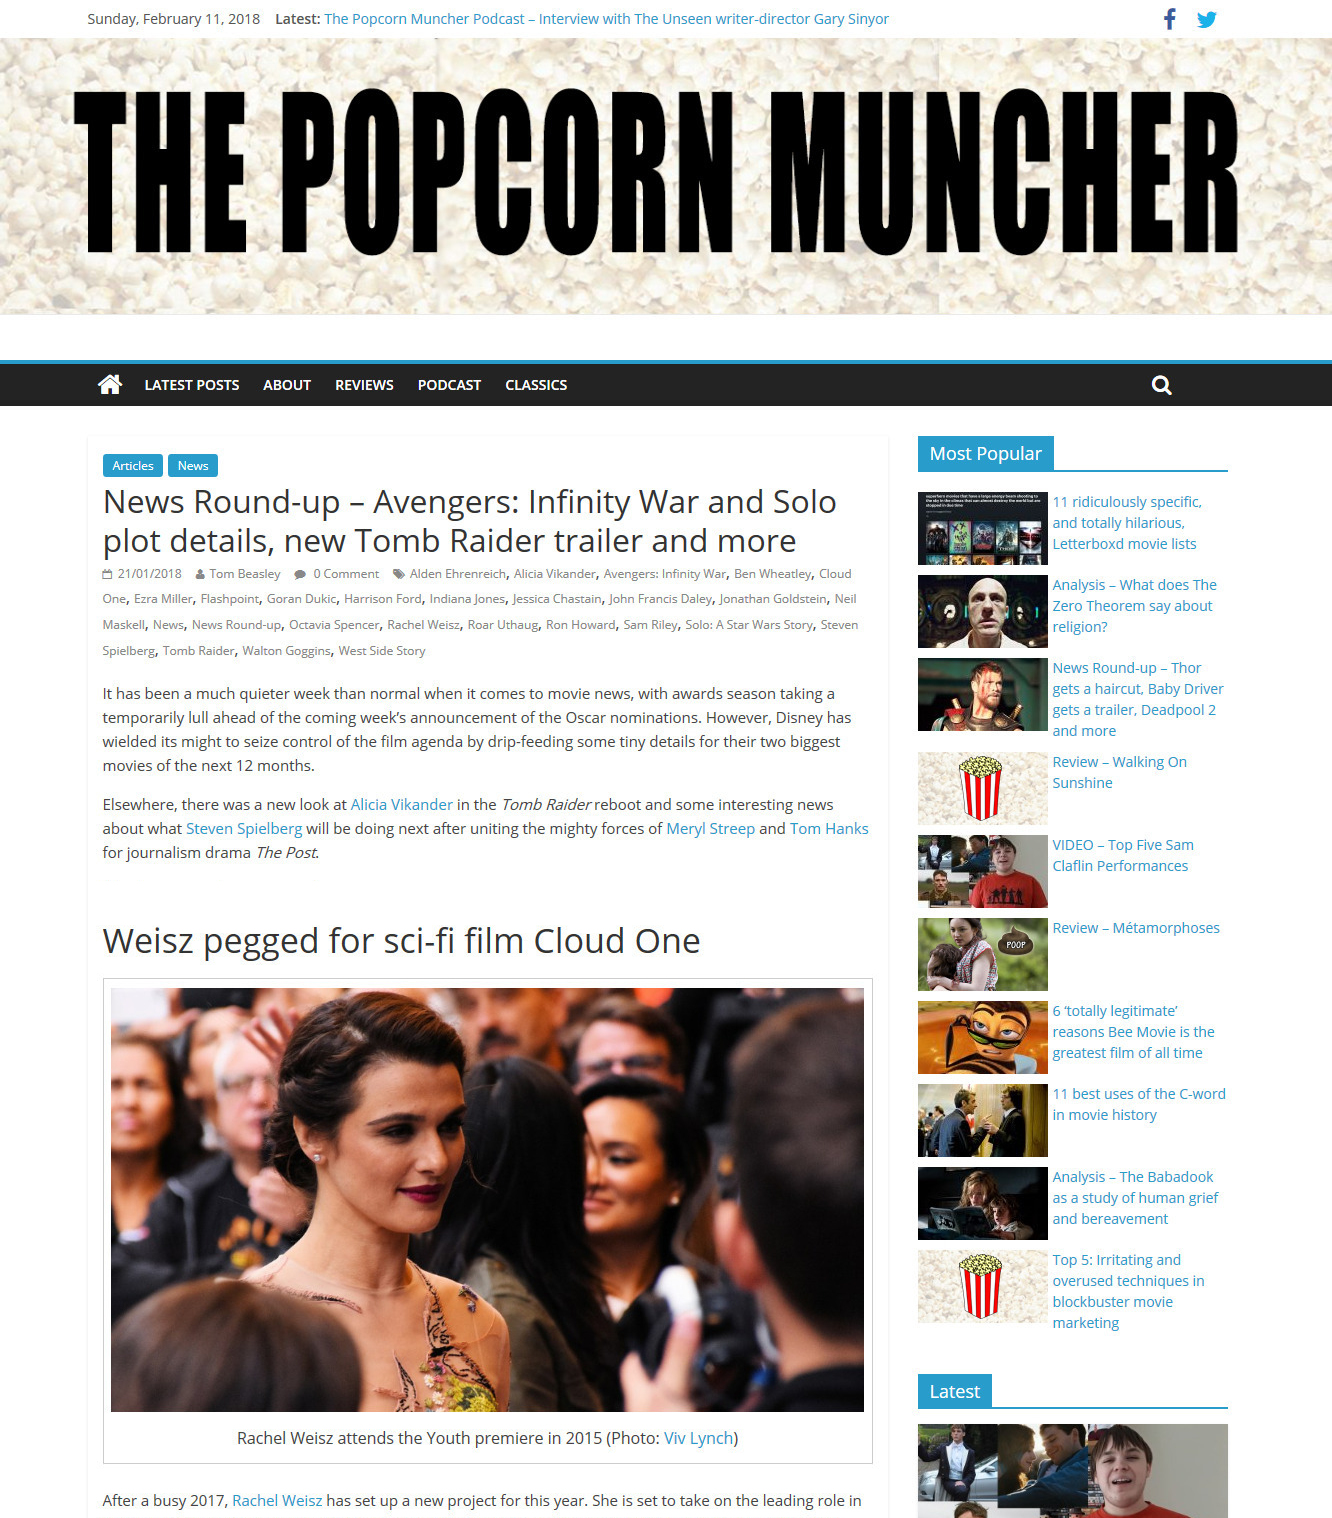 screenshot-www.thepopcornmuncher.com-2018-02-10-20-09-33.jpg